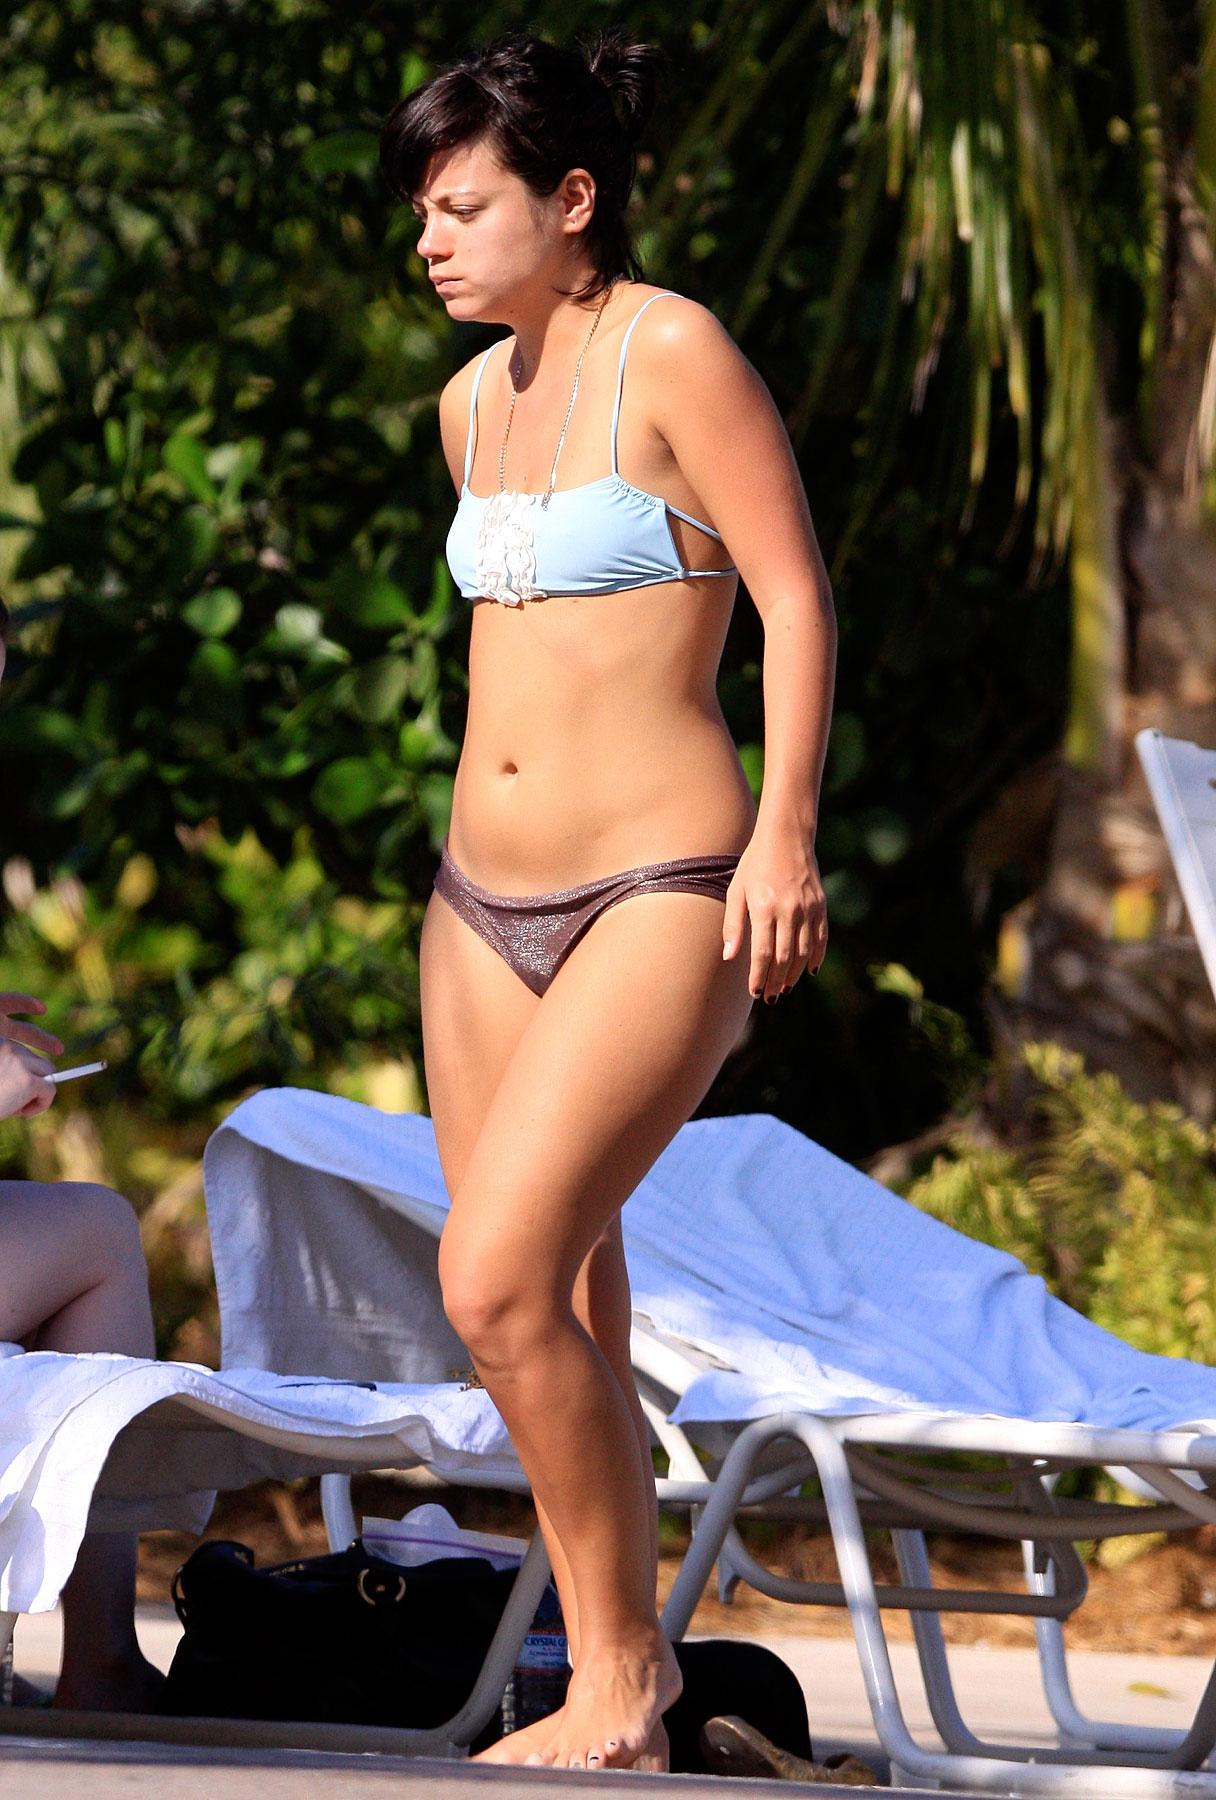 Lily Allen: Bikini Time in the Bahamas